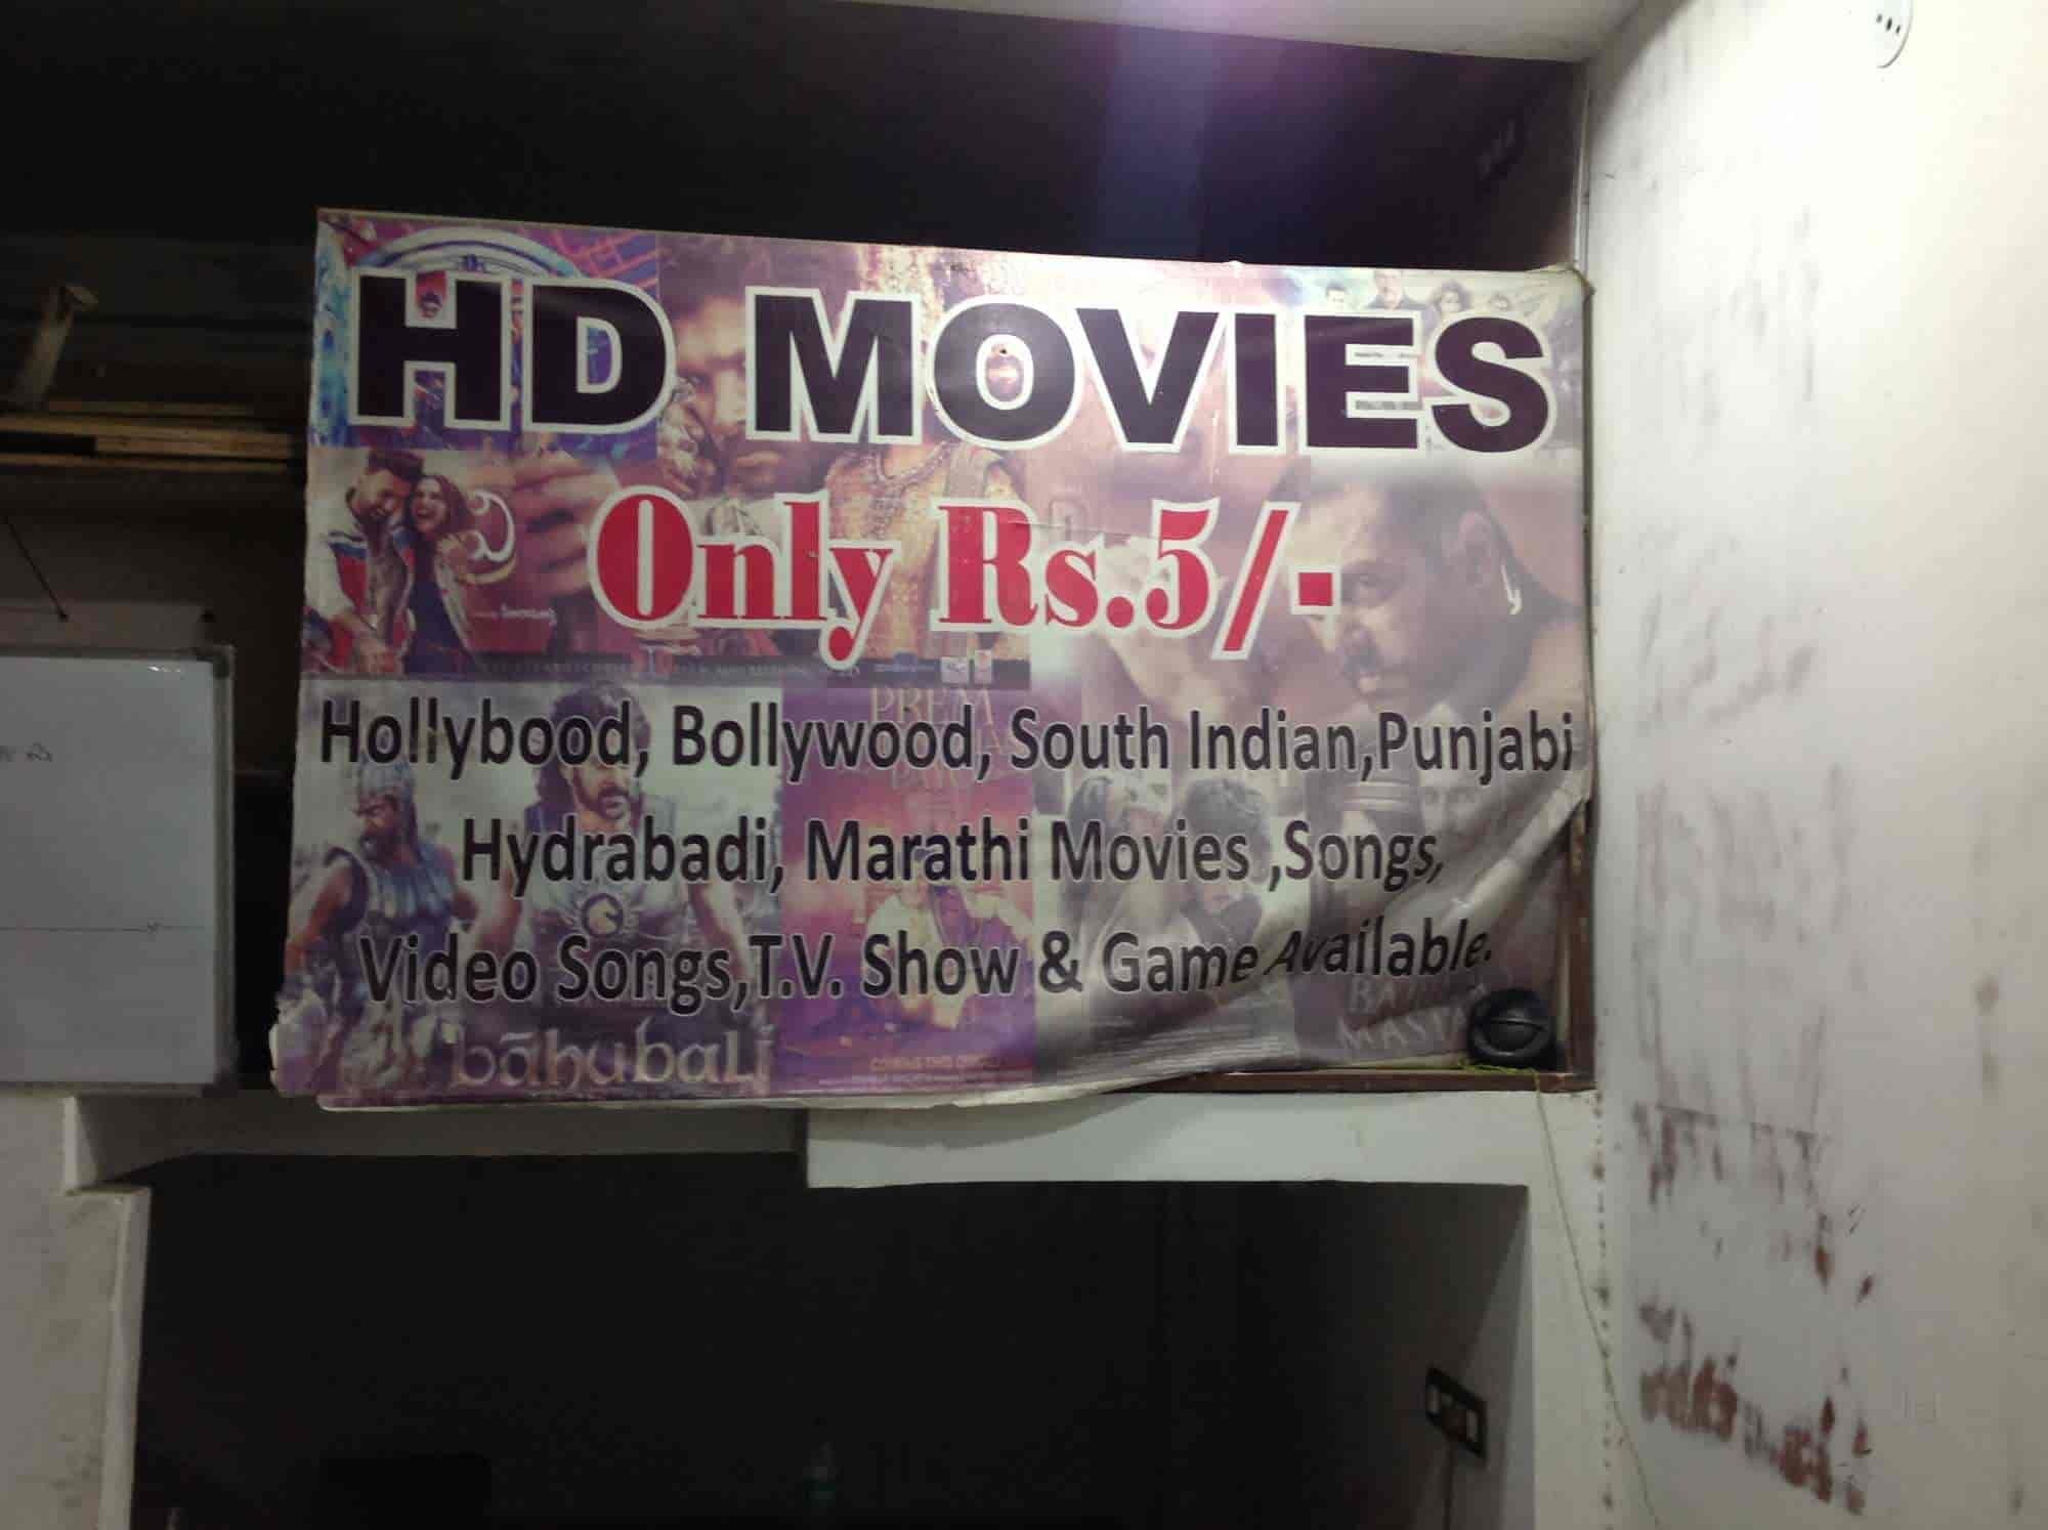 Sonu hd movie downloding photos, vijay nagar, indore pictures.